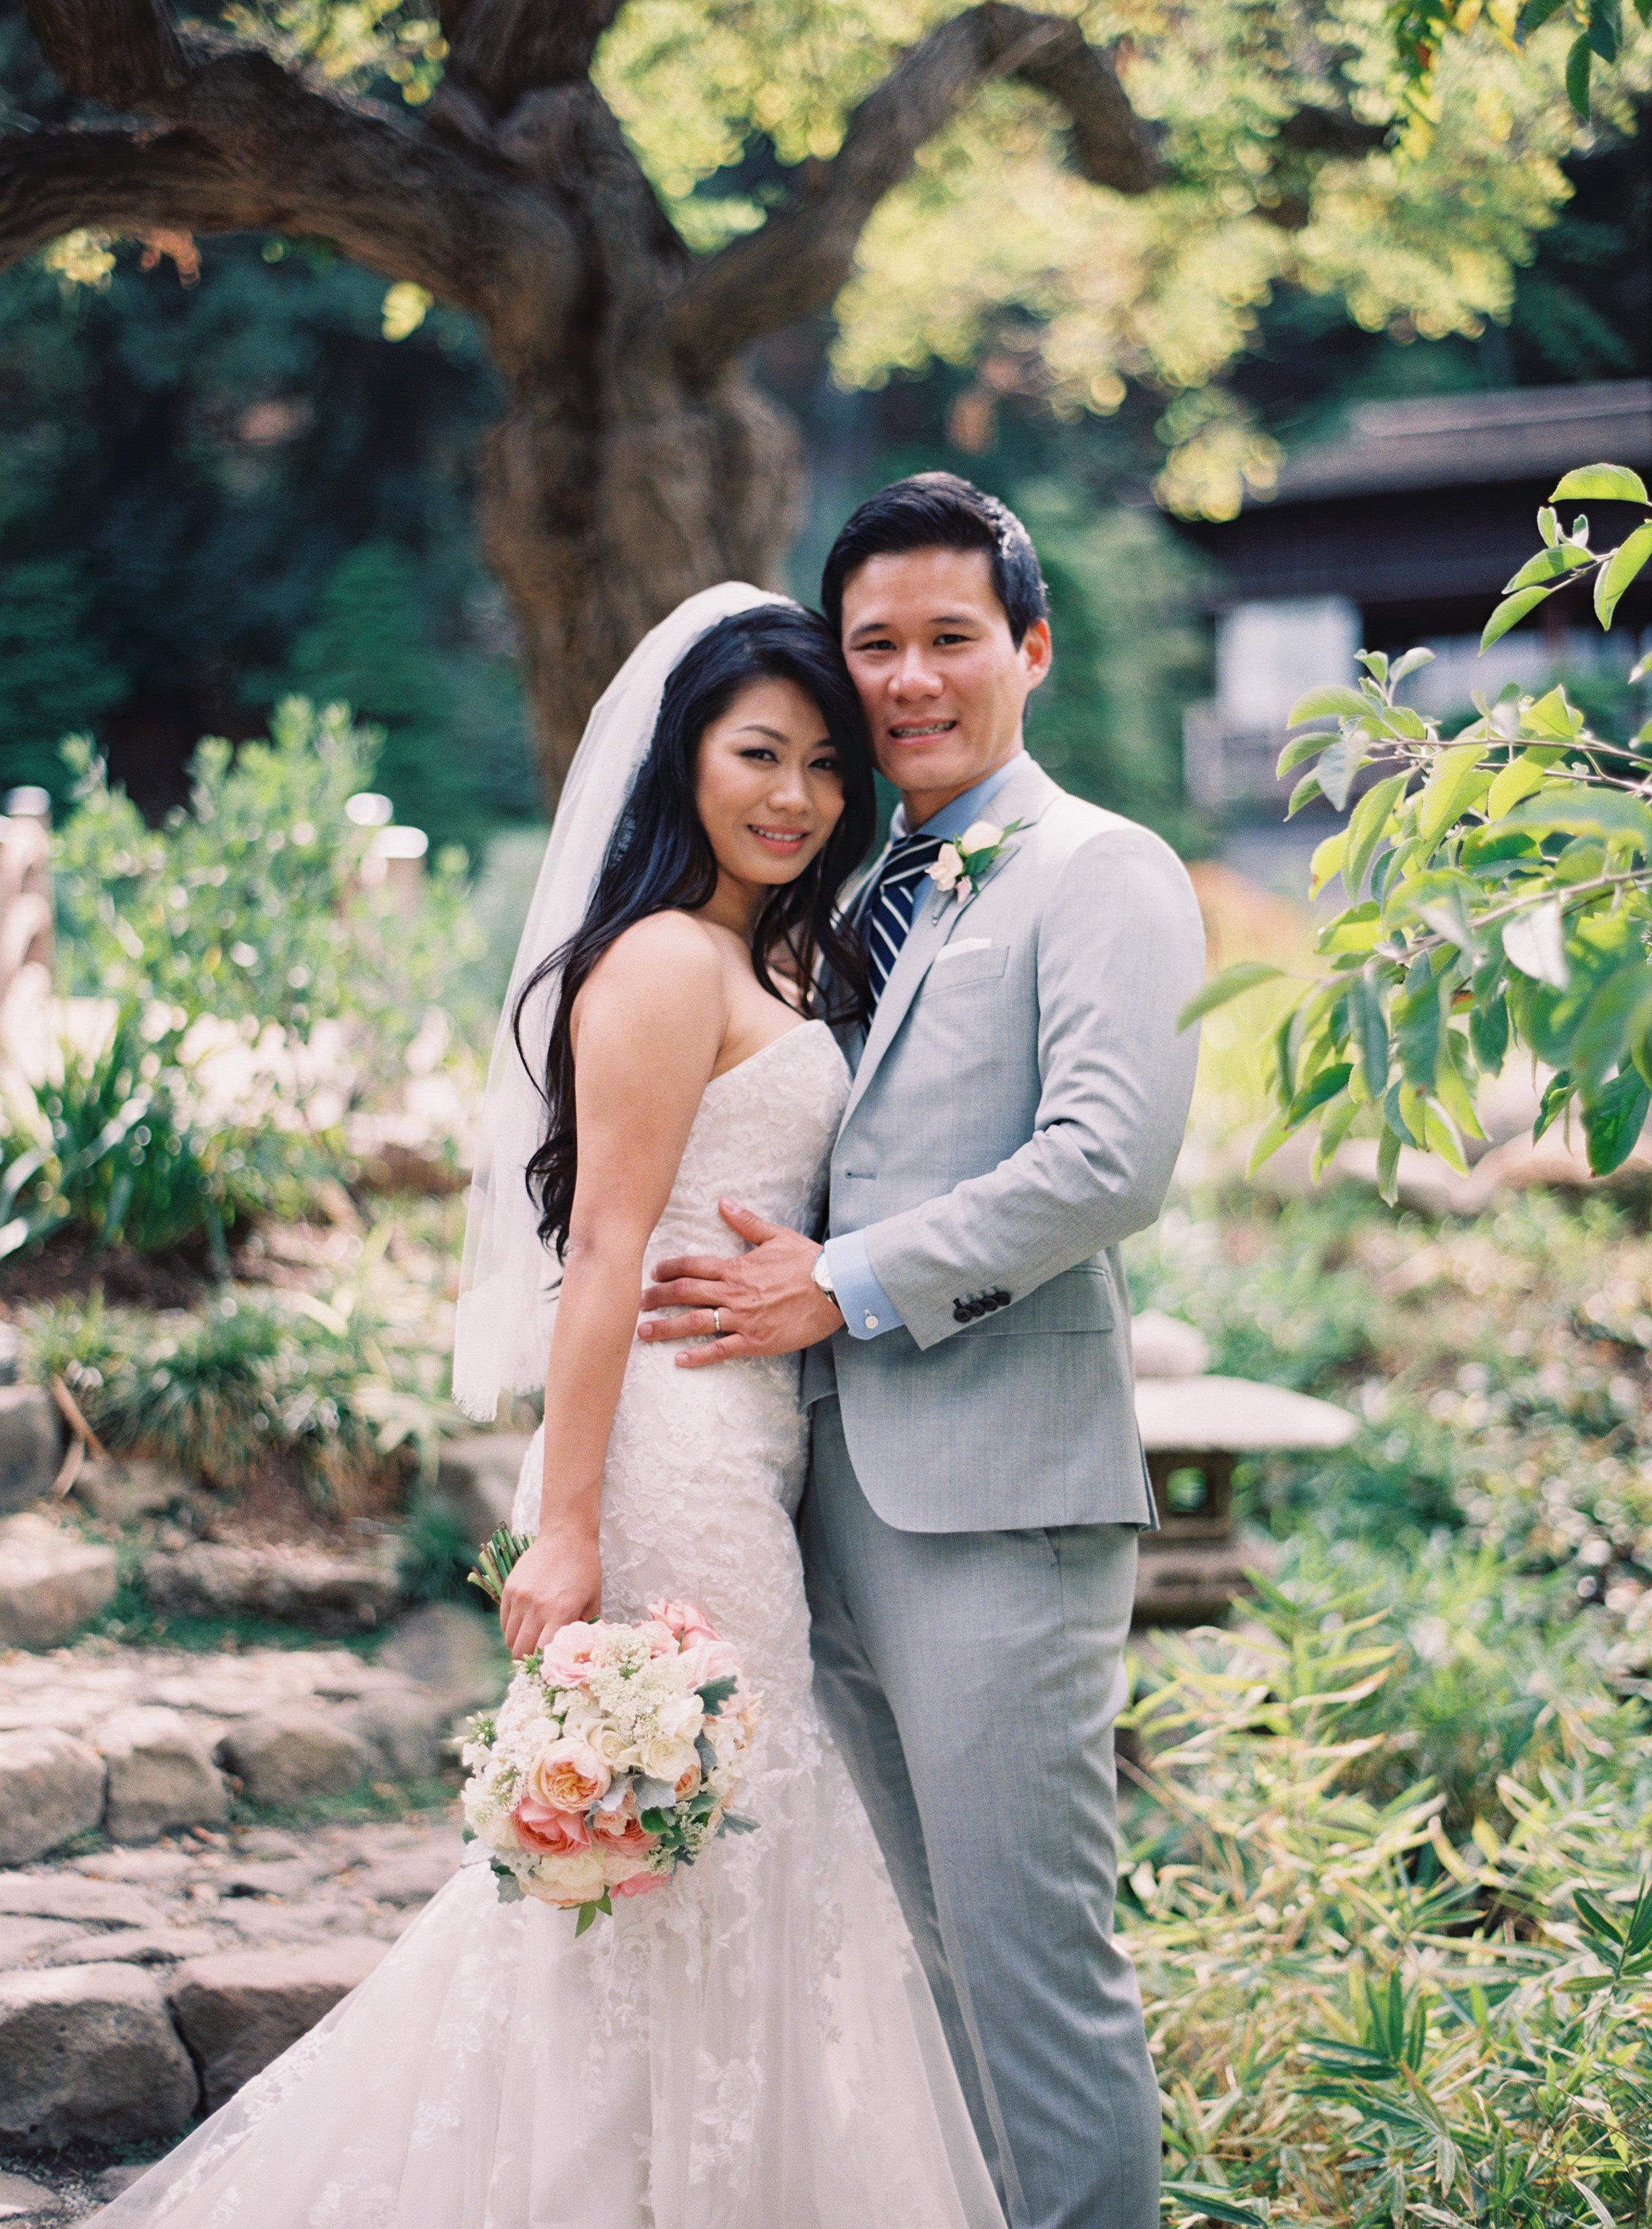 LindaTranPhotography-Flowerstory-Saratoga-wedding-garden.jpg